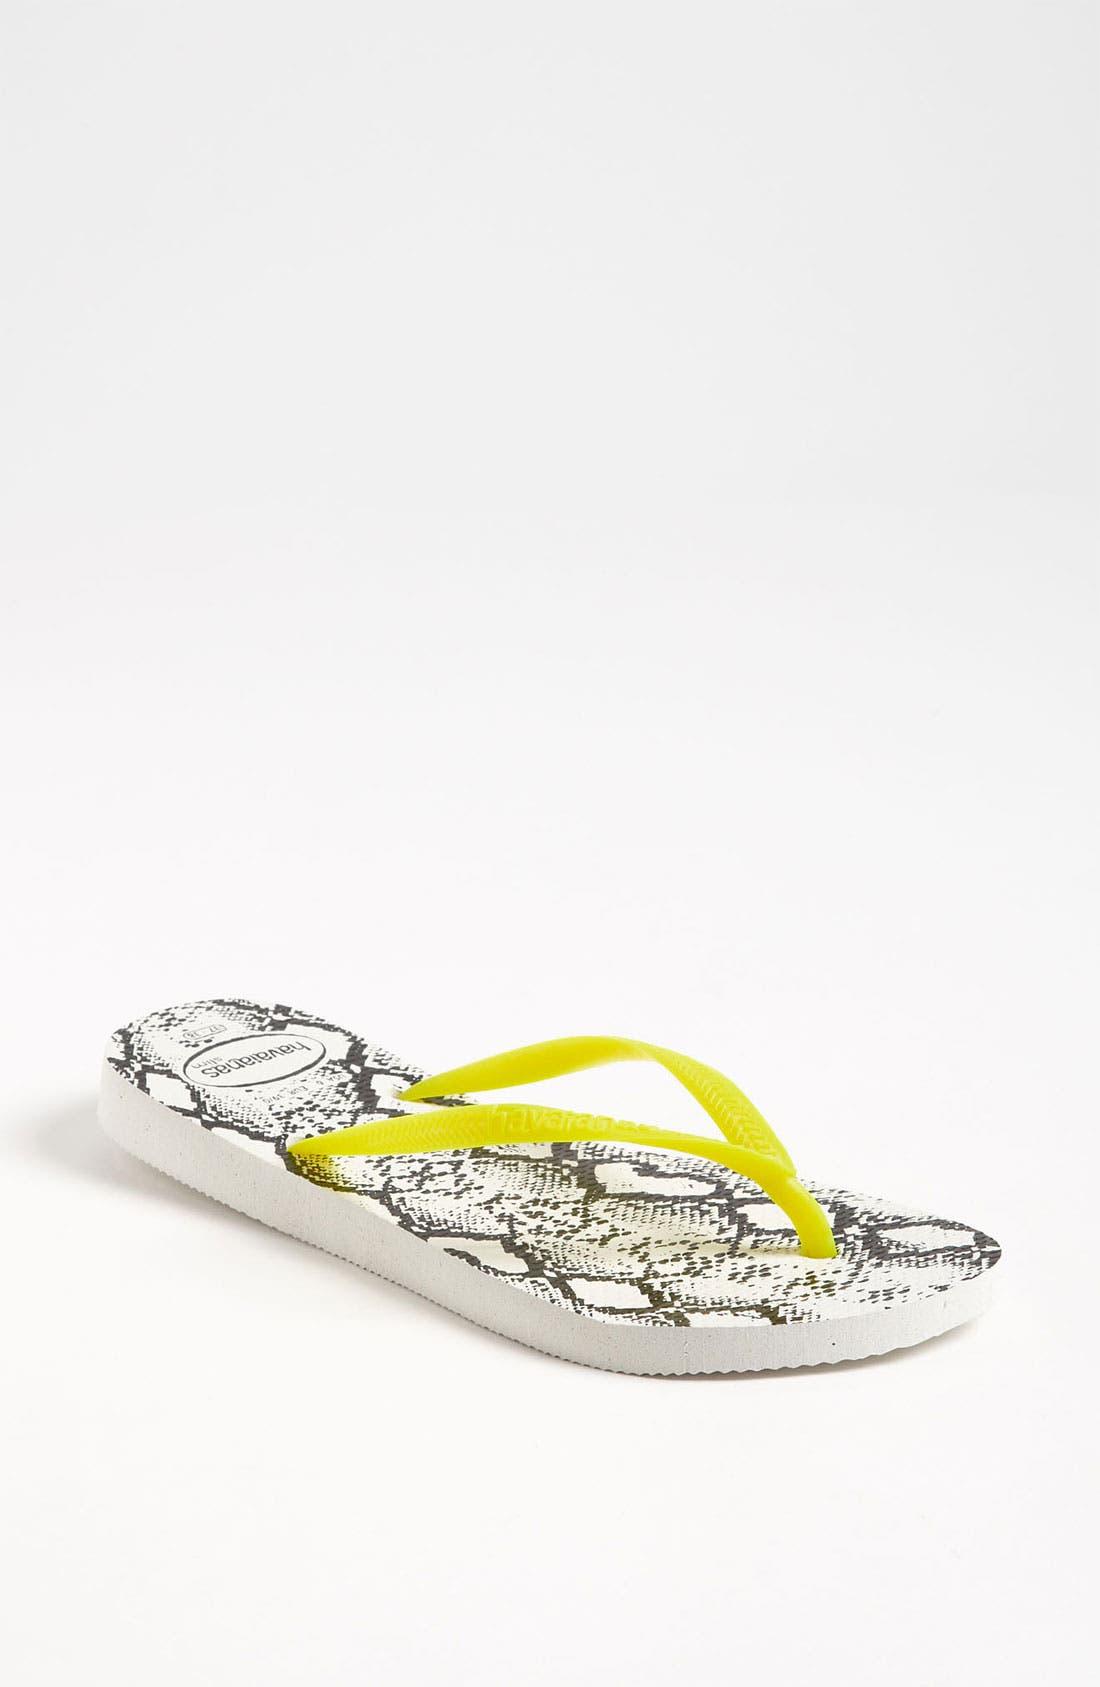 Alternate Image 1 Selected - Havaianas 'Slim Fluorescent Animal' Sandal (Women)